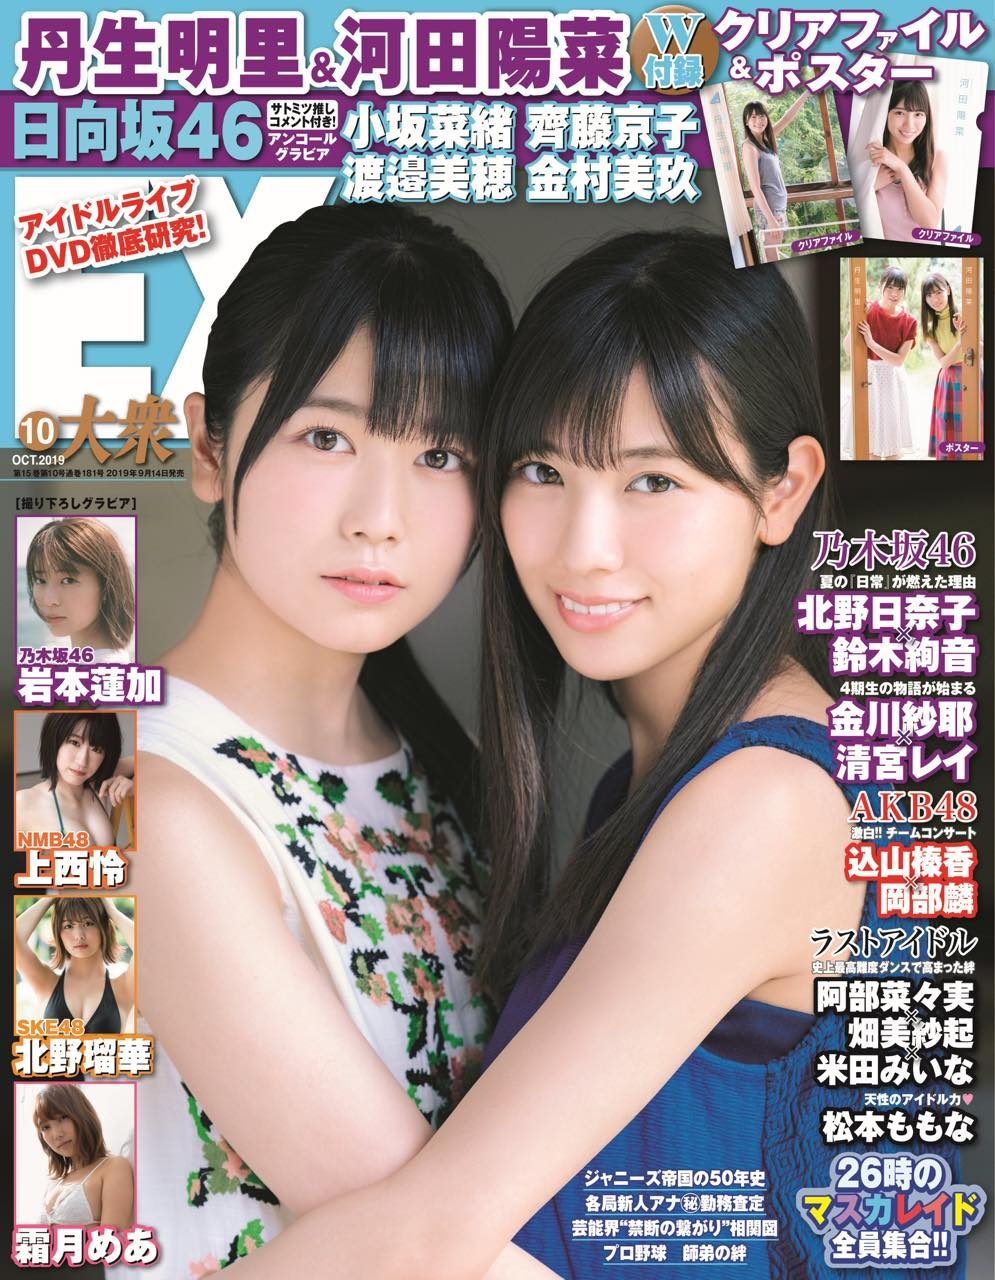 SKE48 北野瑠華、NMB48 上西怜、グラビア掲載!「EX大衆 2019年10月号」9/14発売!